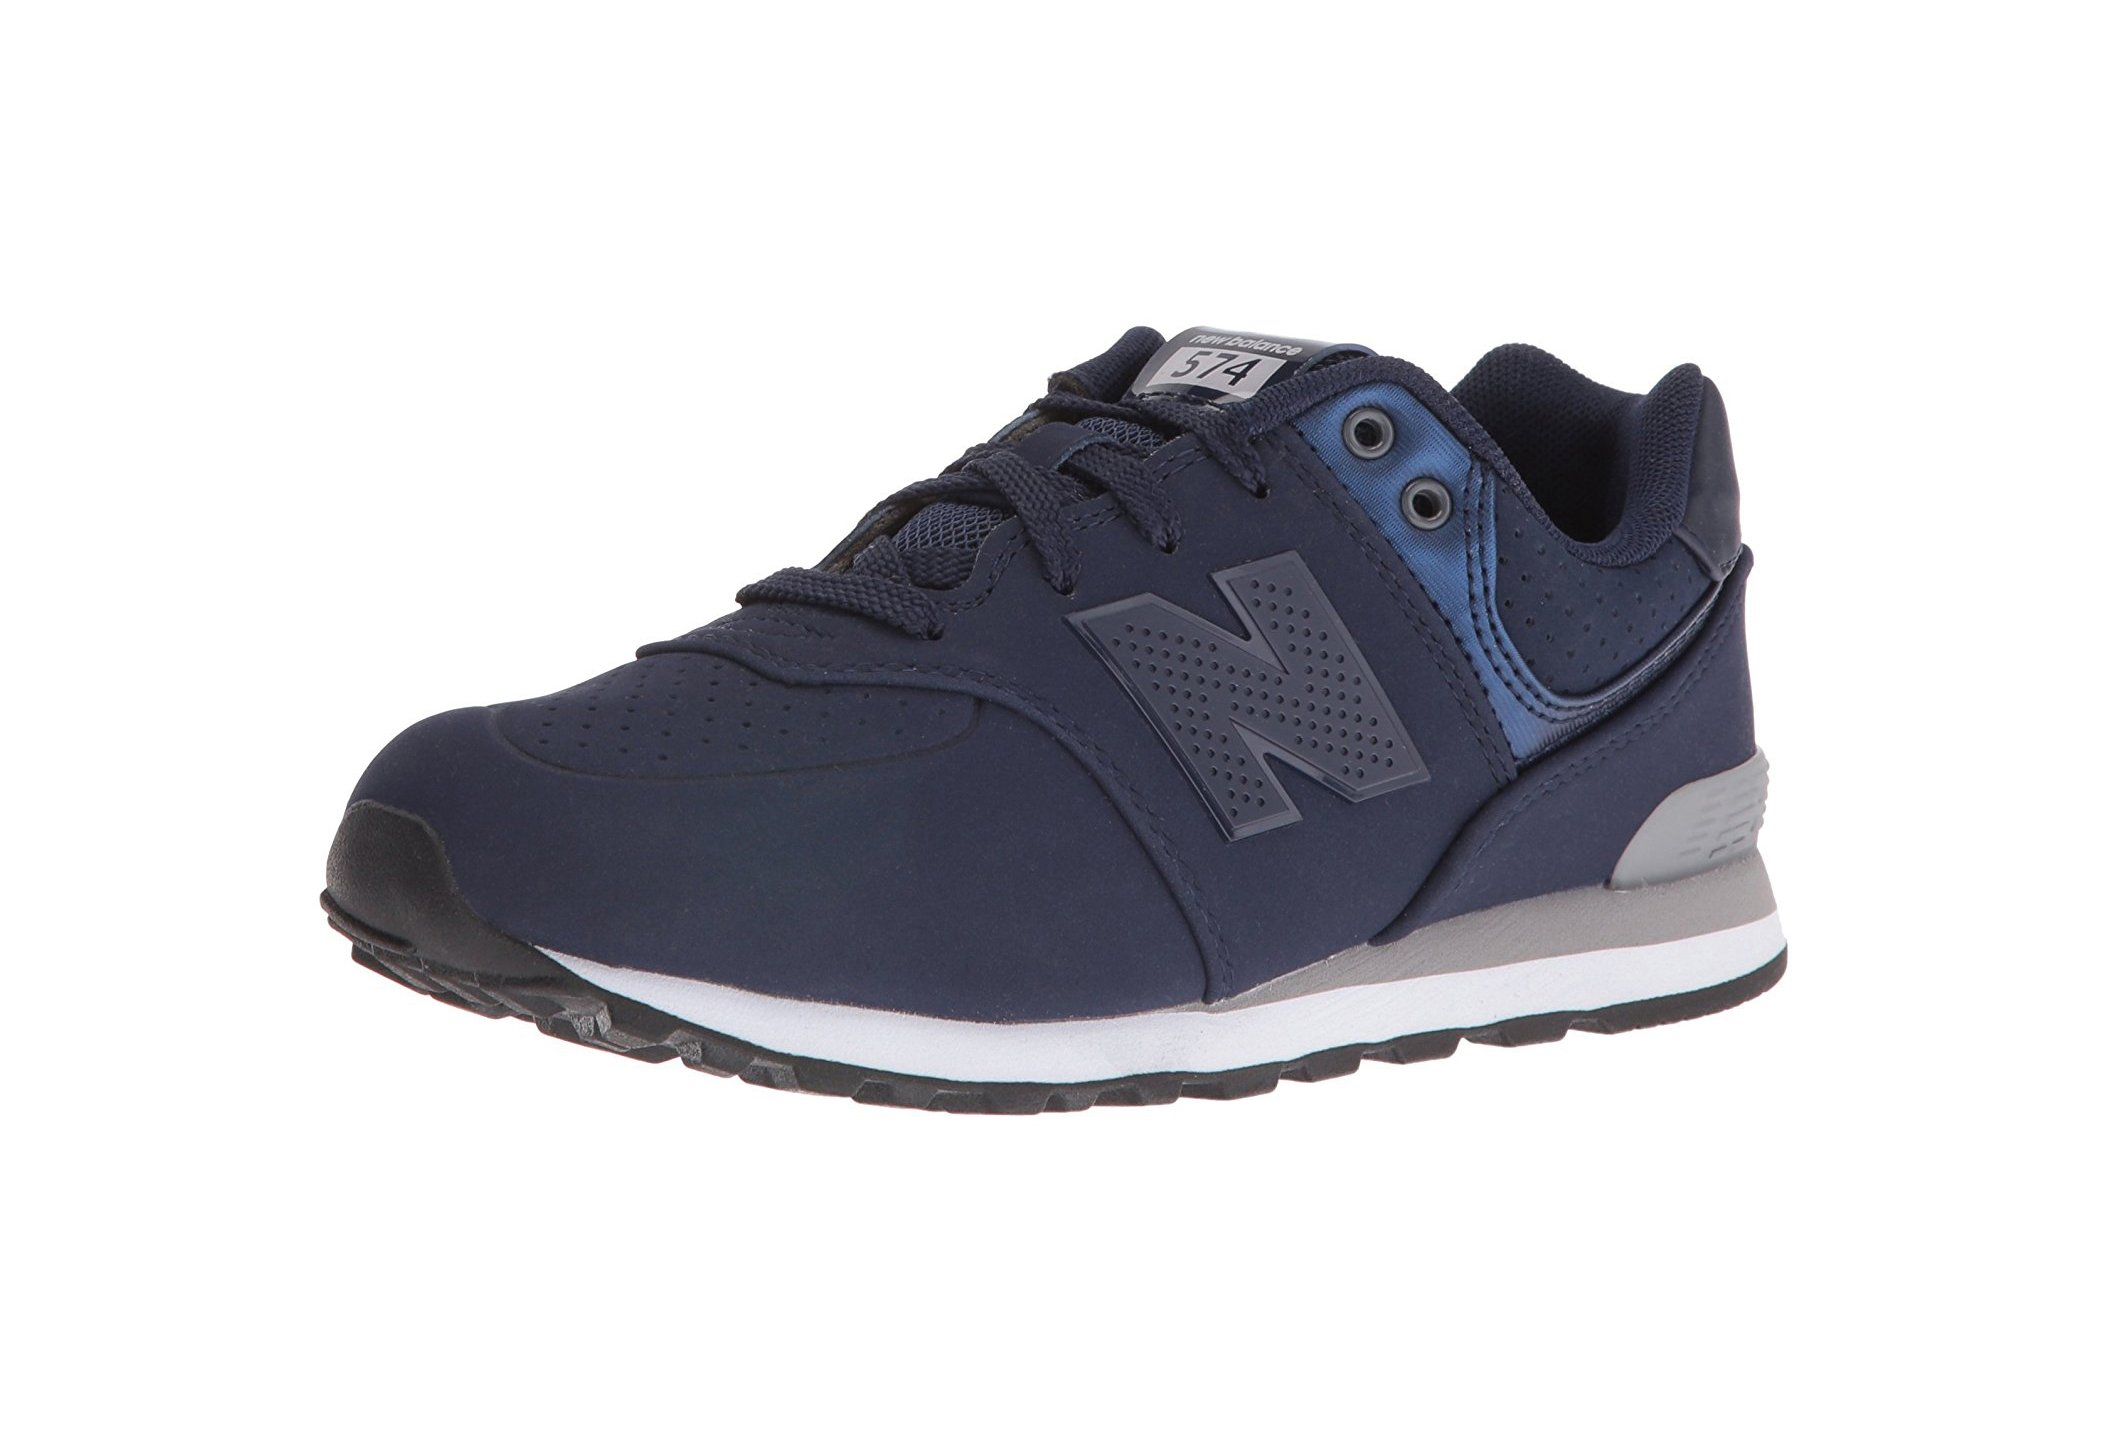 b616232f30132 Galleon - New Balance Boys' KL574V1 Paint Chip Pack Sneaker Blue/Grey 5 M  US Big Kid